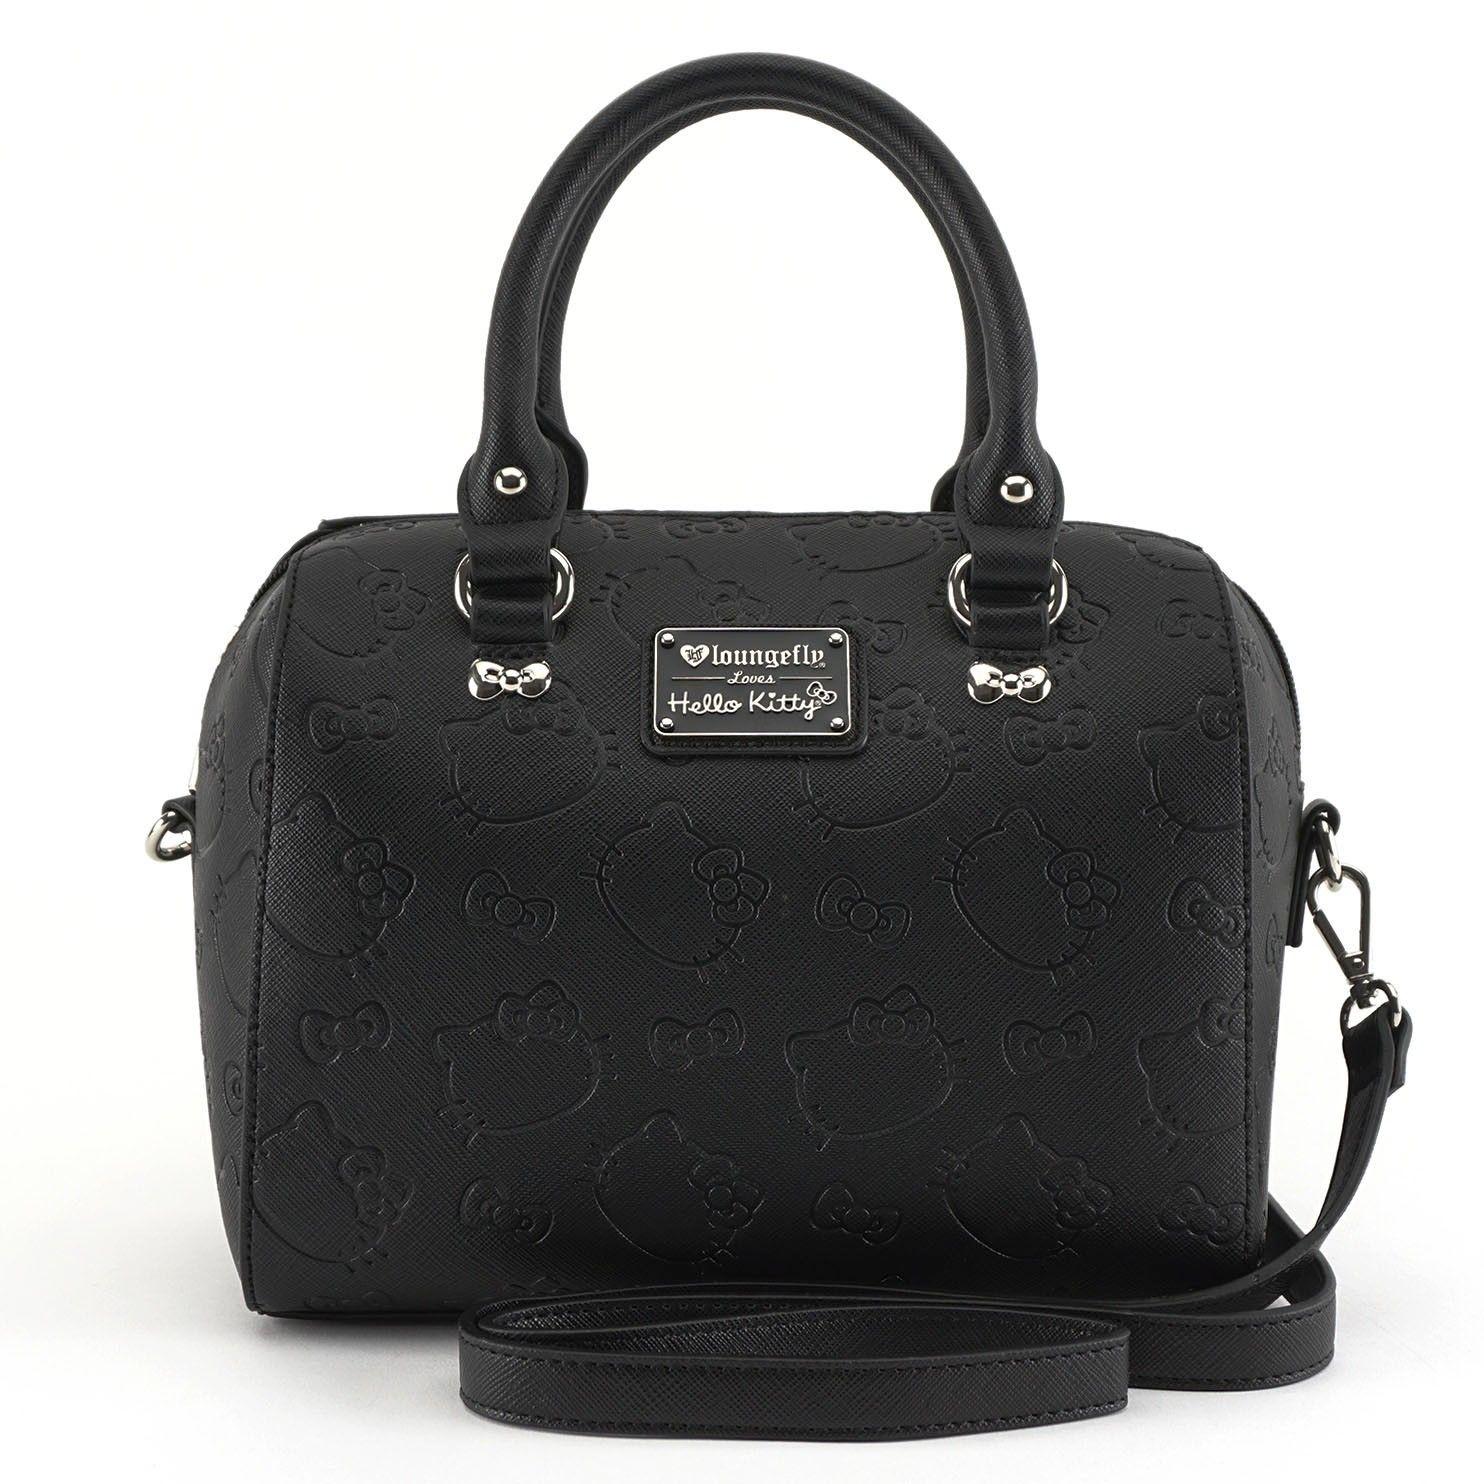 6f70086db0 Loungefly x Hello Kitty Head   Bows Duffle Bag - Crossbody bags - Bags